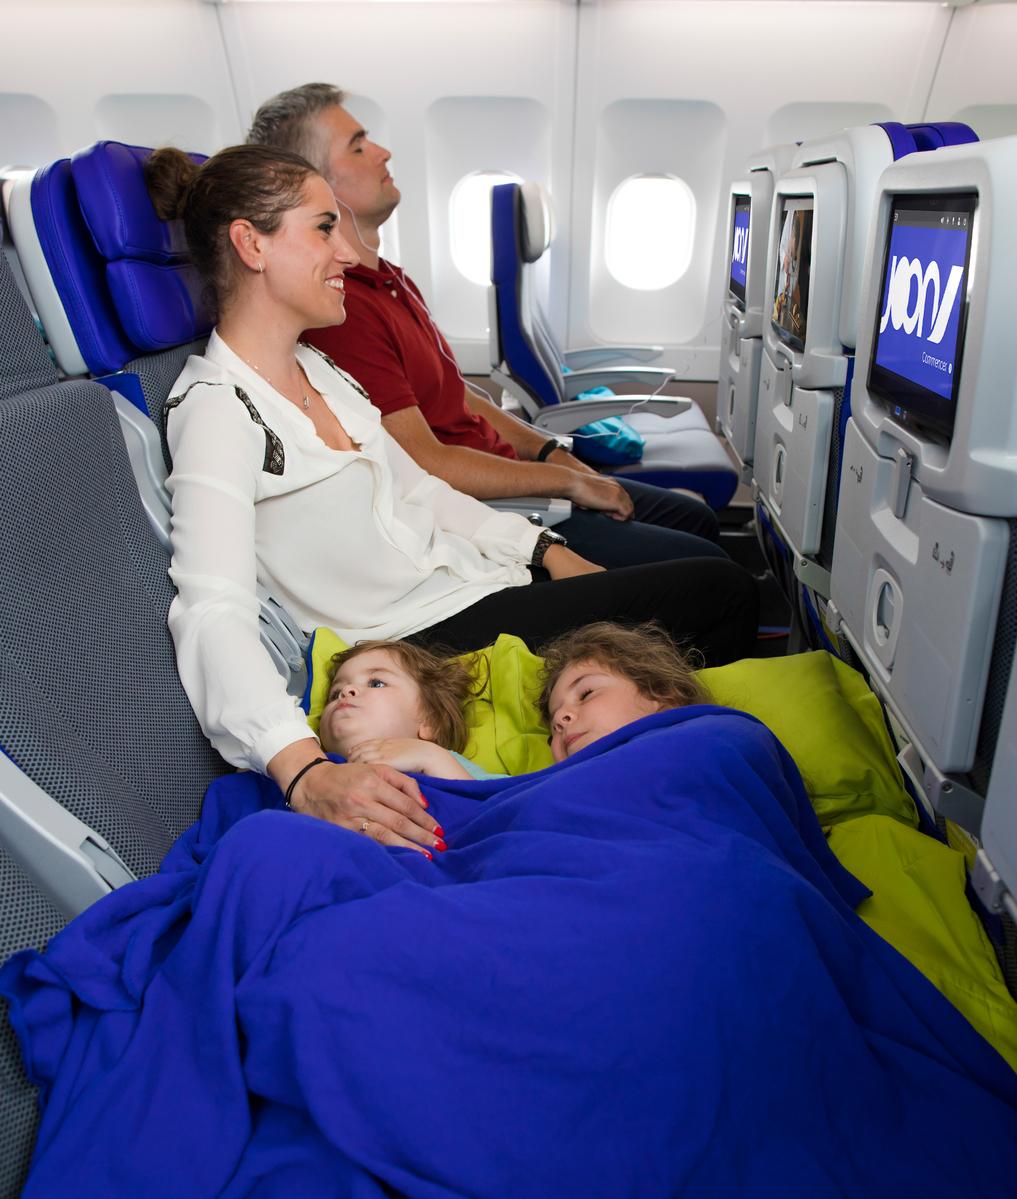 Joon Launches Cosy Joon A New Family Travel Experience